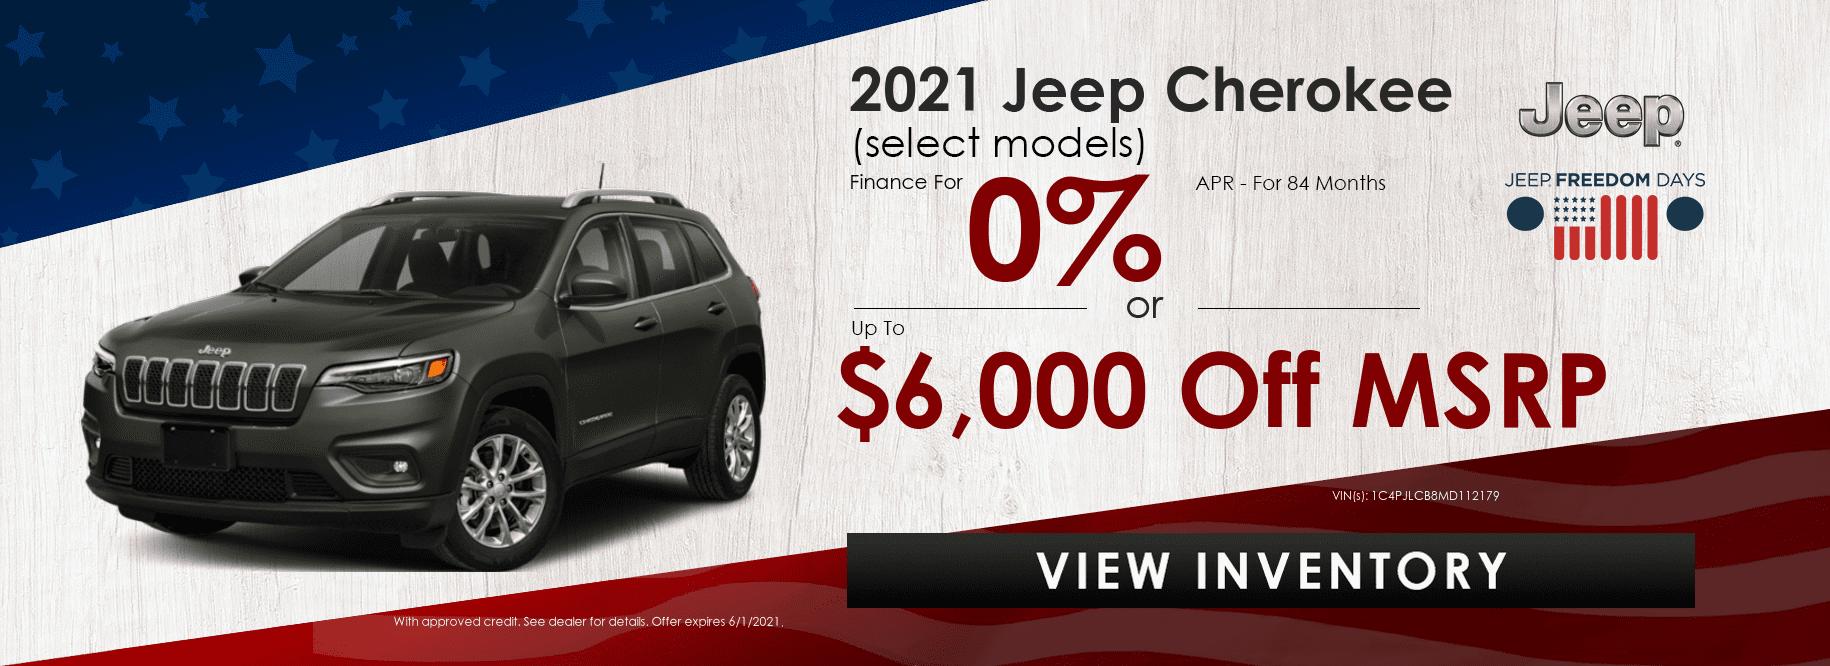 2021-Jeep-Cherokee-(select-models)-56